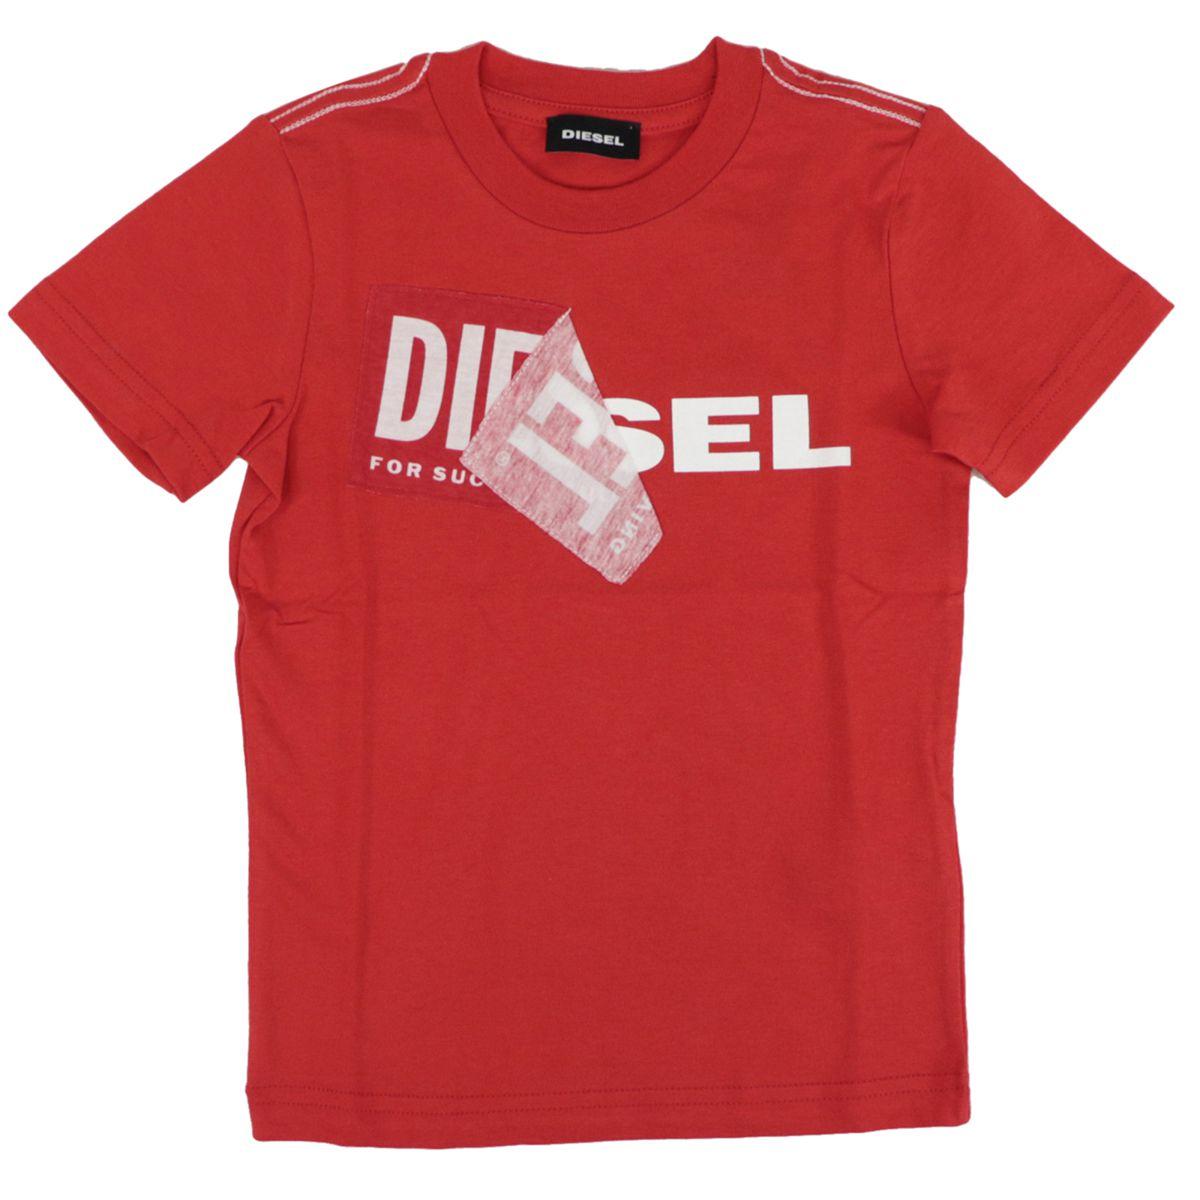 TOQUEB cotton t-shirt with print Red Diesel